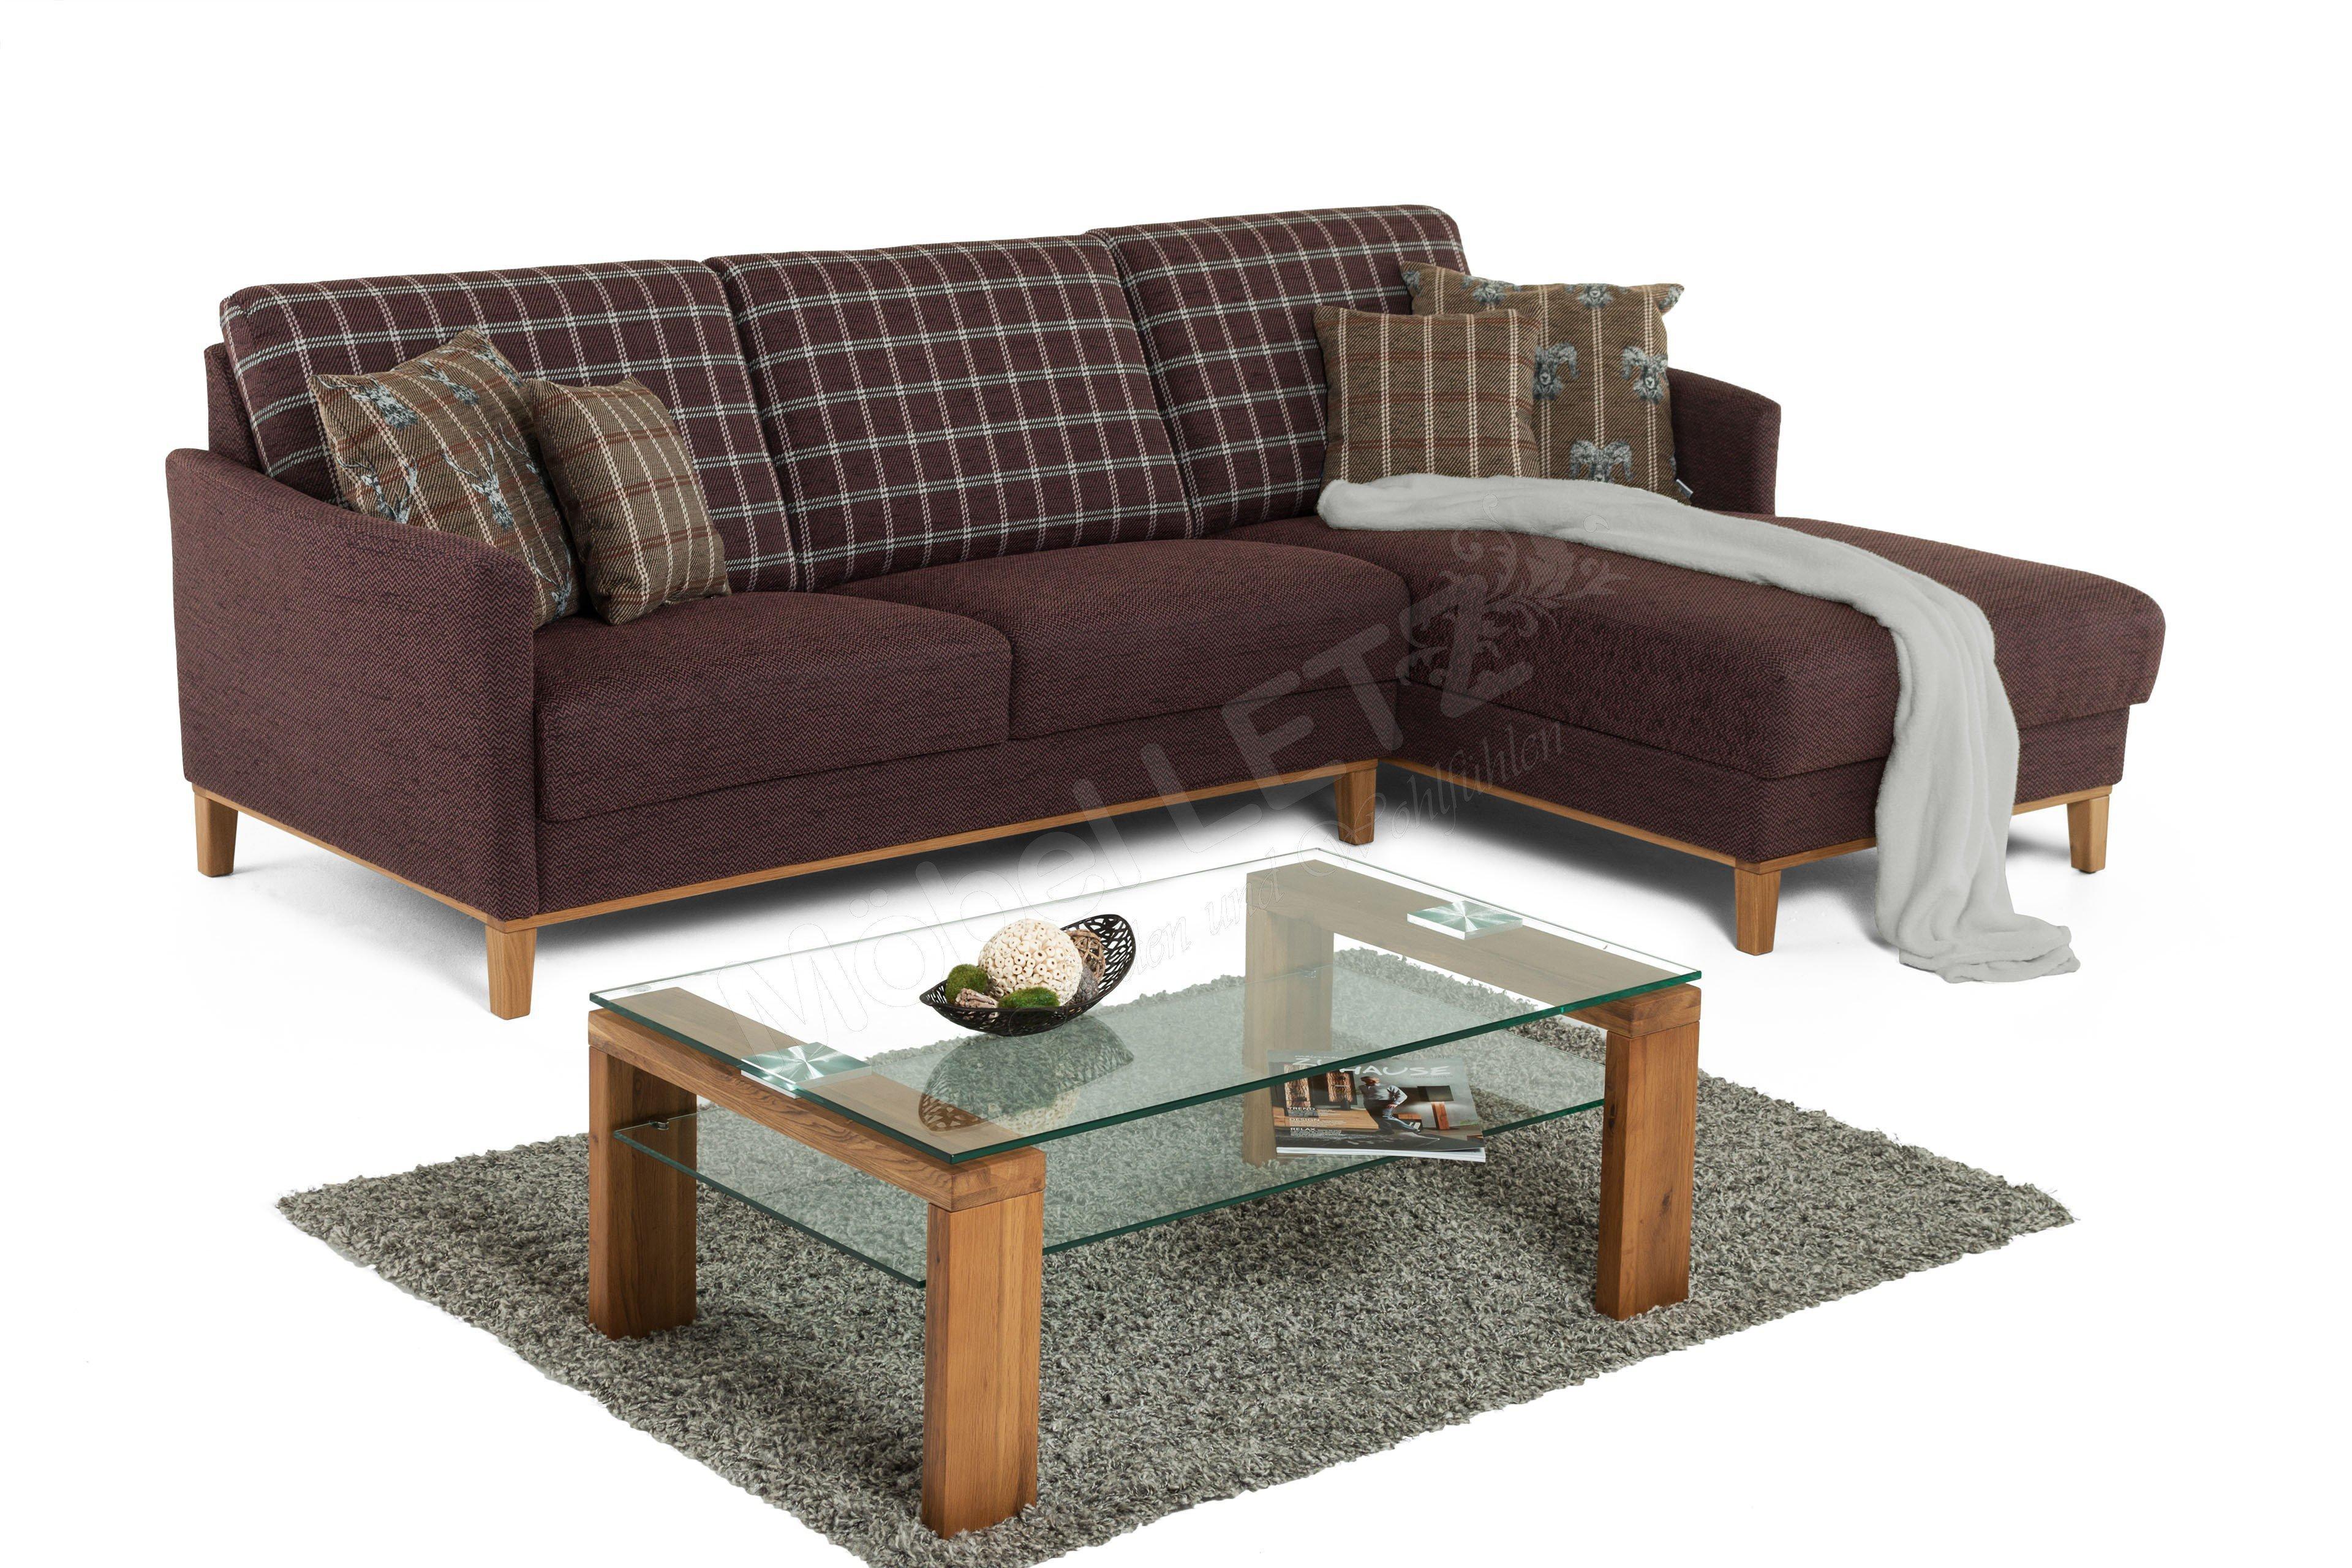 preiswerte polstermbel simple amazing elegant preiswerte new neues ikea kura ikea lva canopy. Black Bedroom Furniture Sets. Home Design Ideas